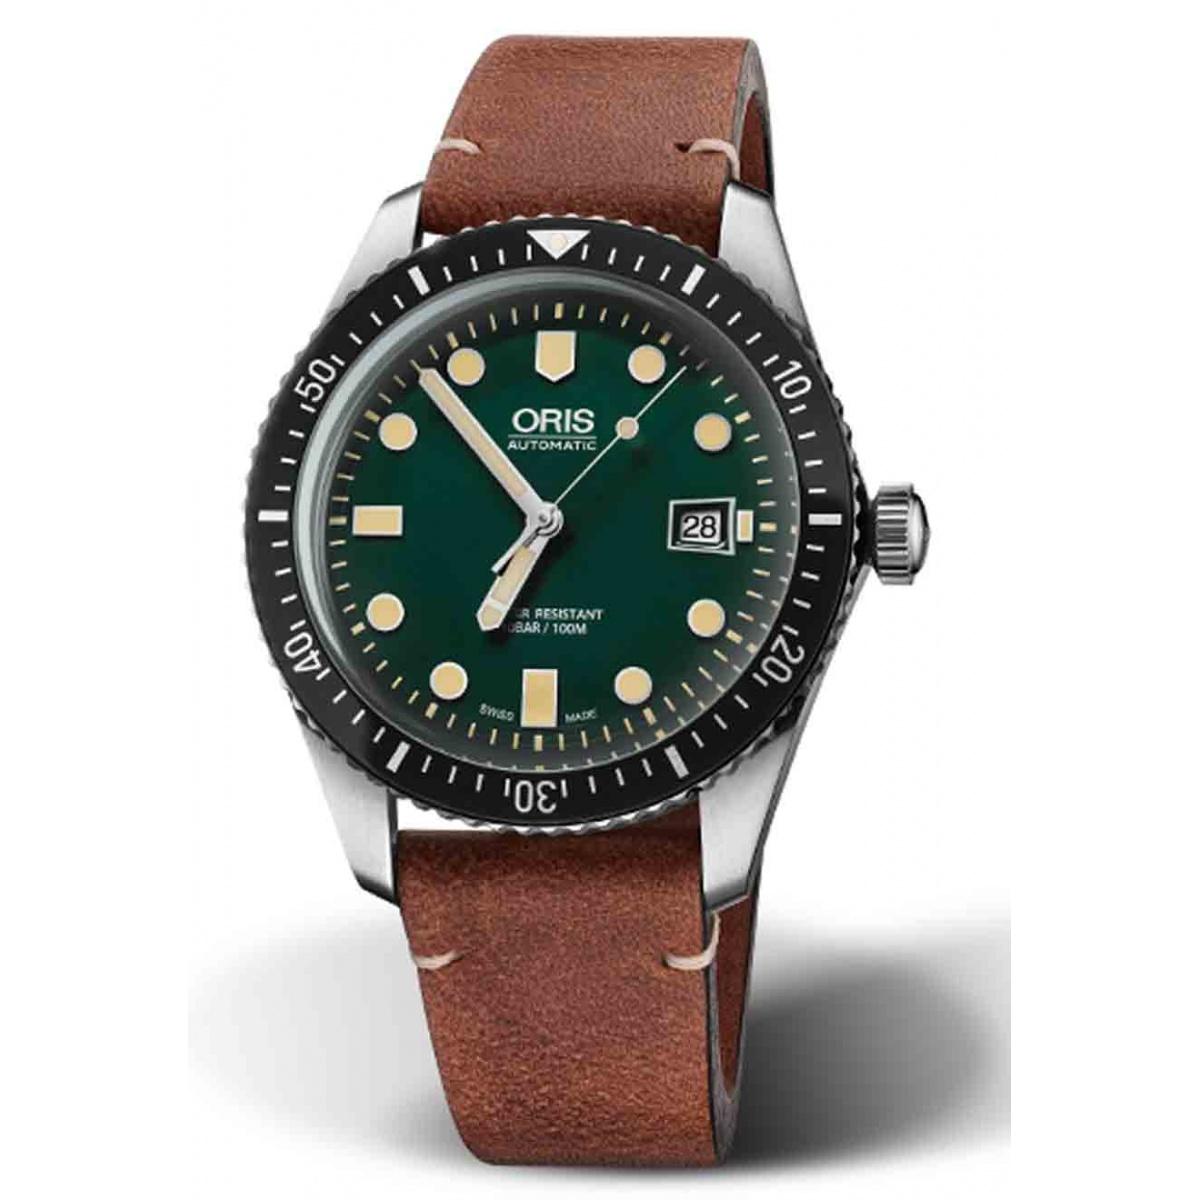 ORIS DIVERS SIXTY-FIVE -100 M ∅42 mm, Esfera verde, brazalete de piel marrón claro